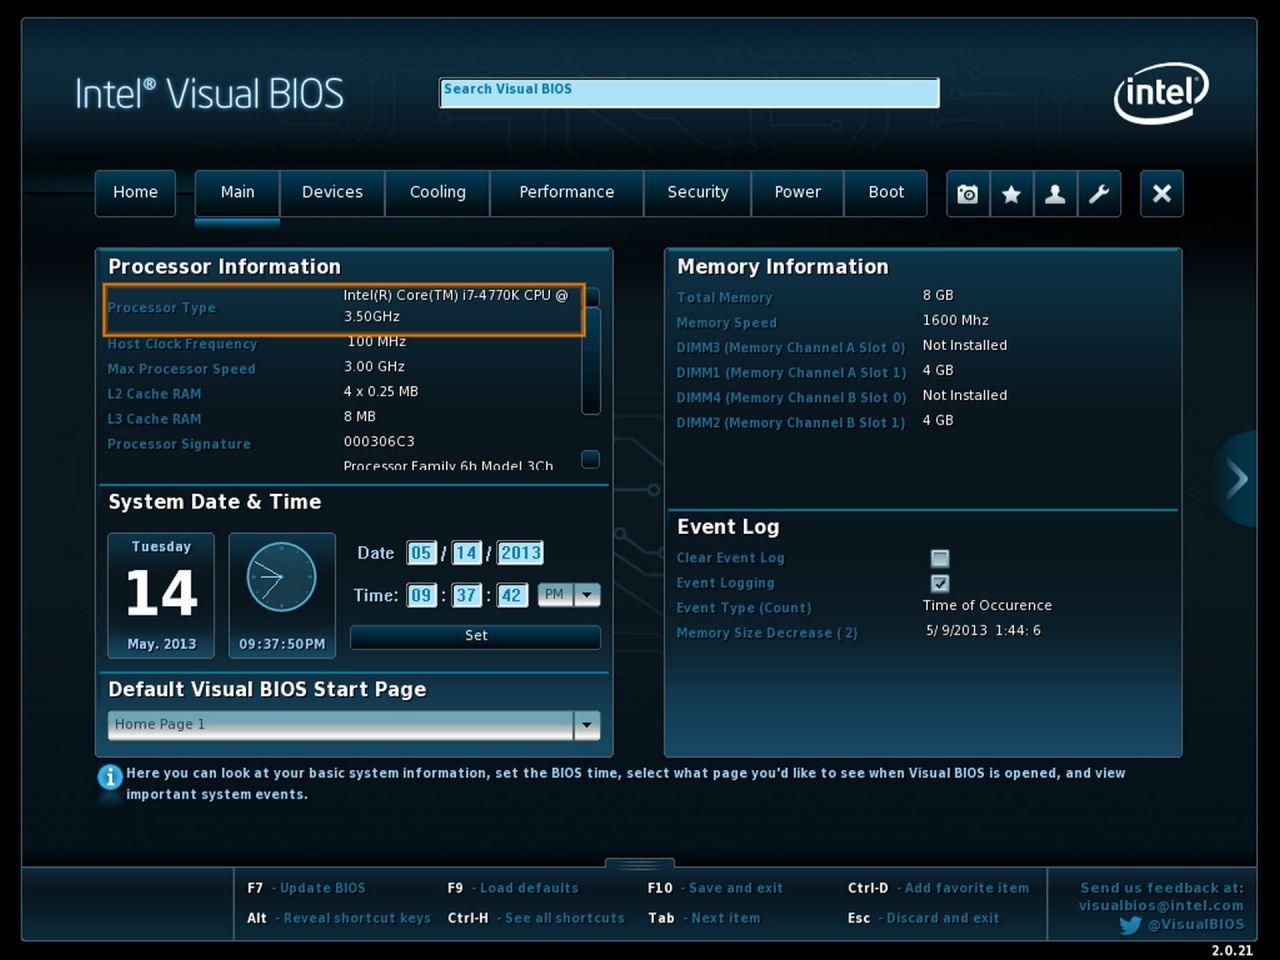 Z87 Intel BIOS11